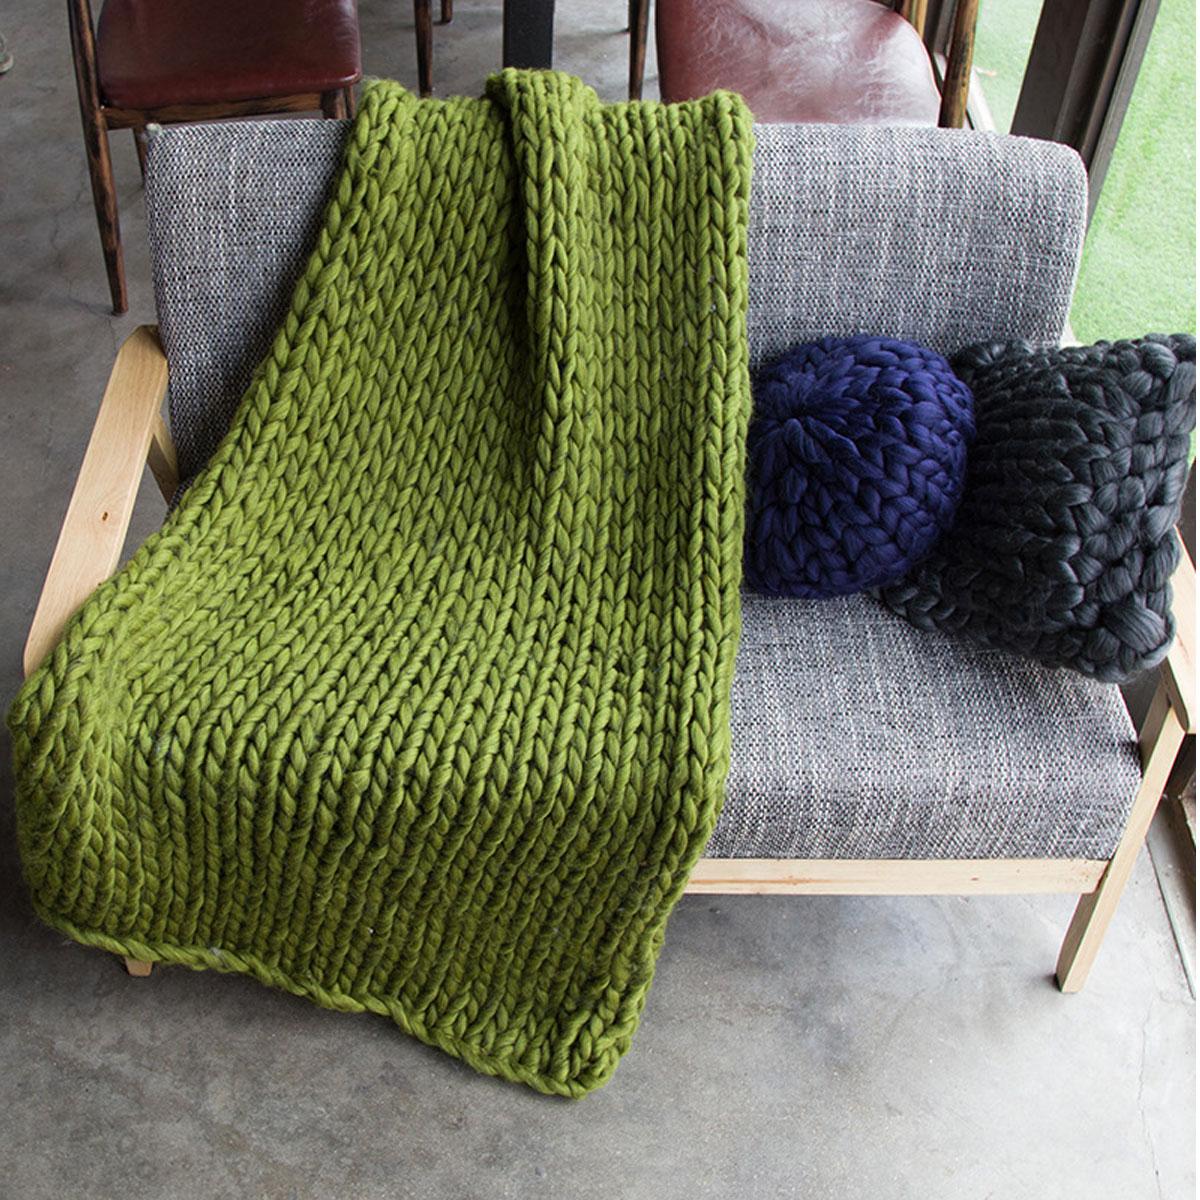 Warm Handmande Chunky Knit Blanket Thick Yarn Merino